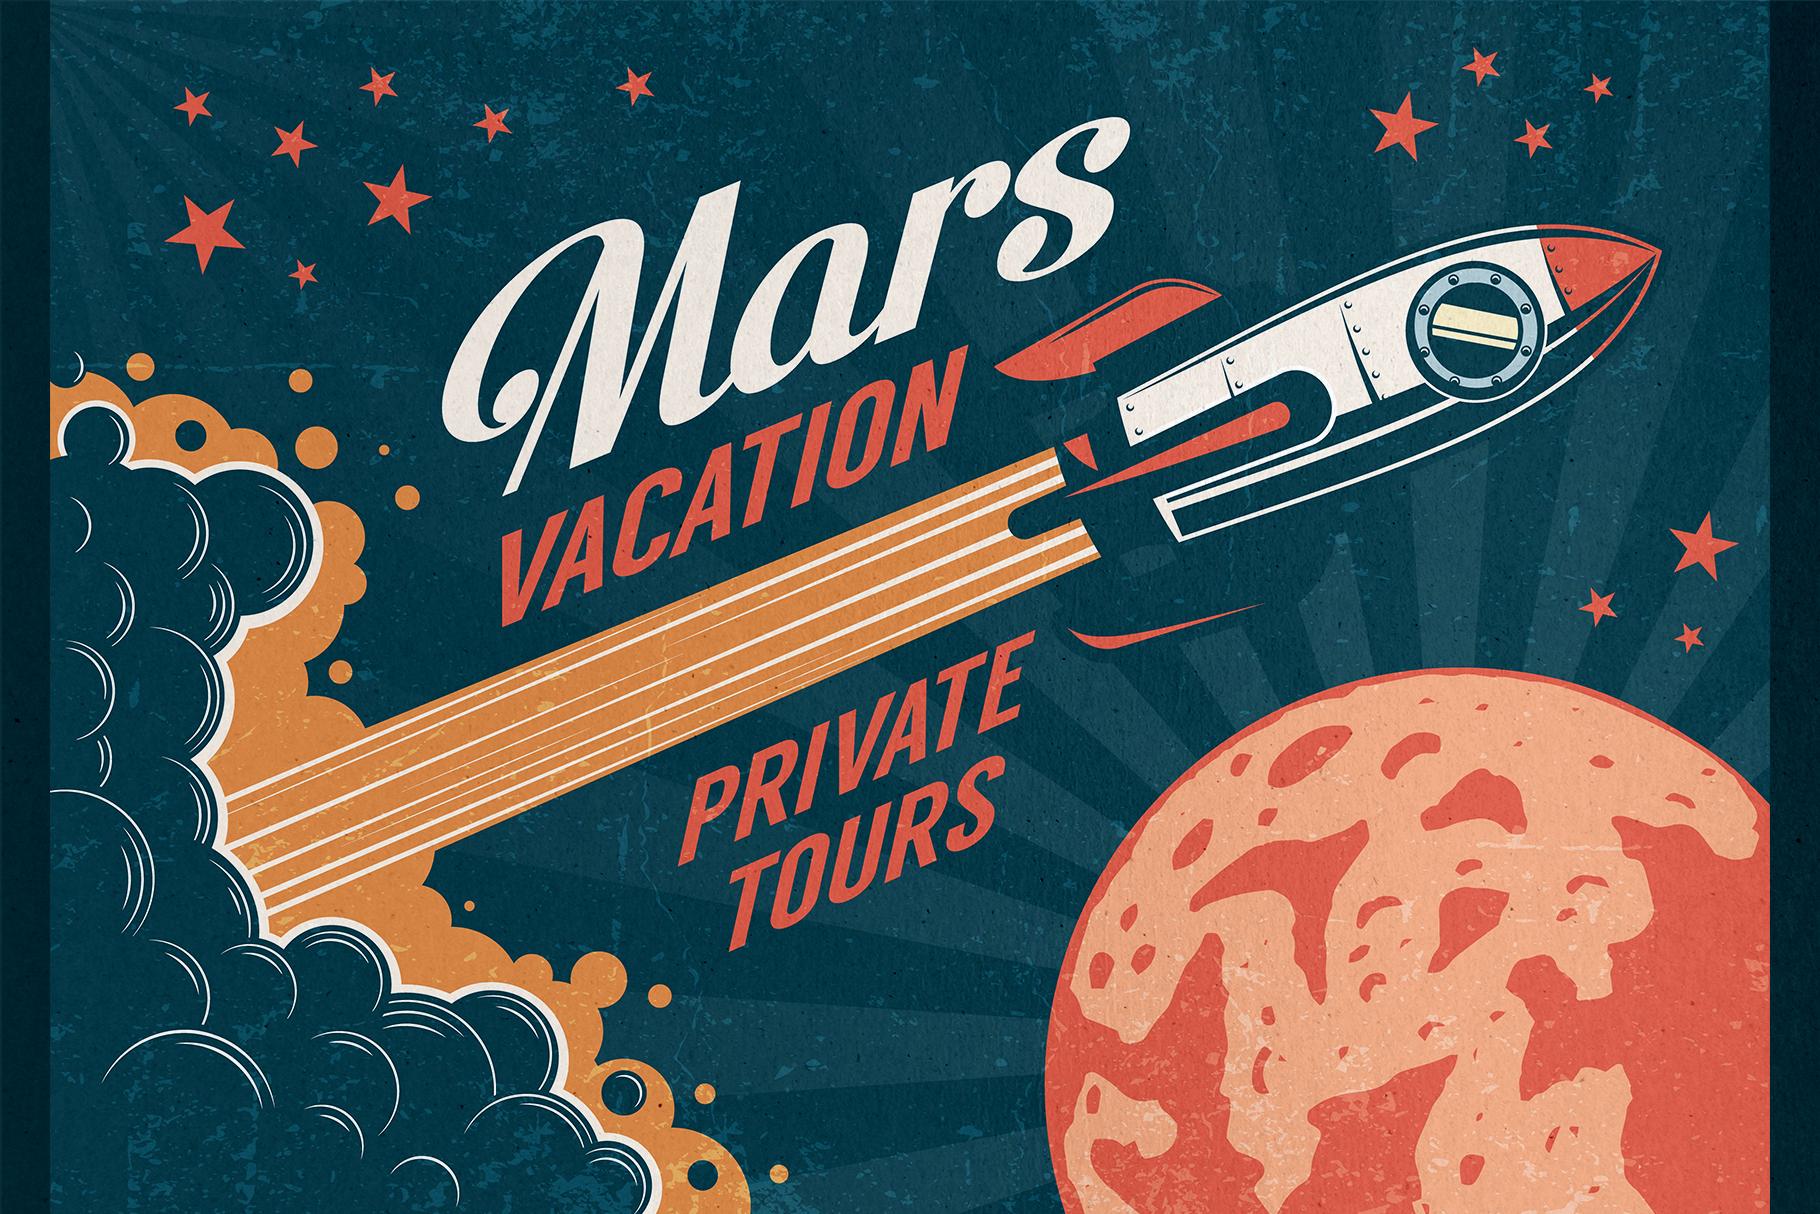 6 Vintage Rocket Posters example image 4